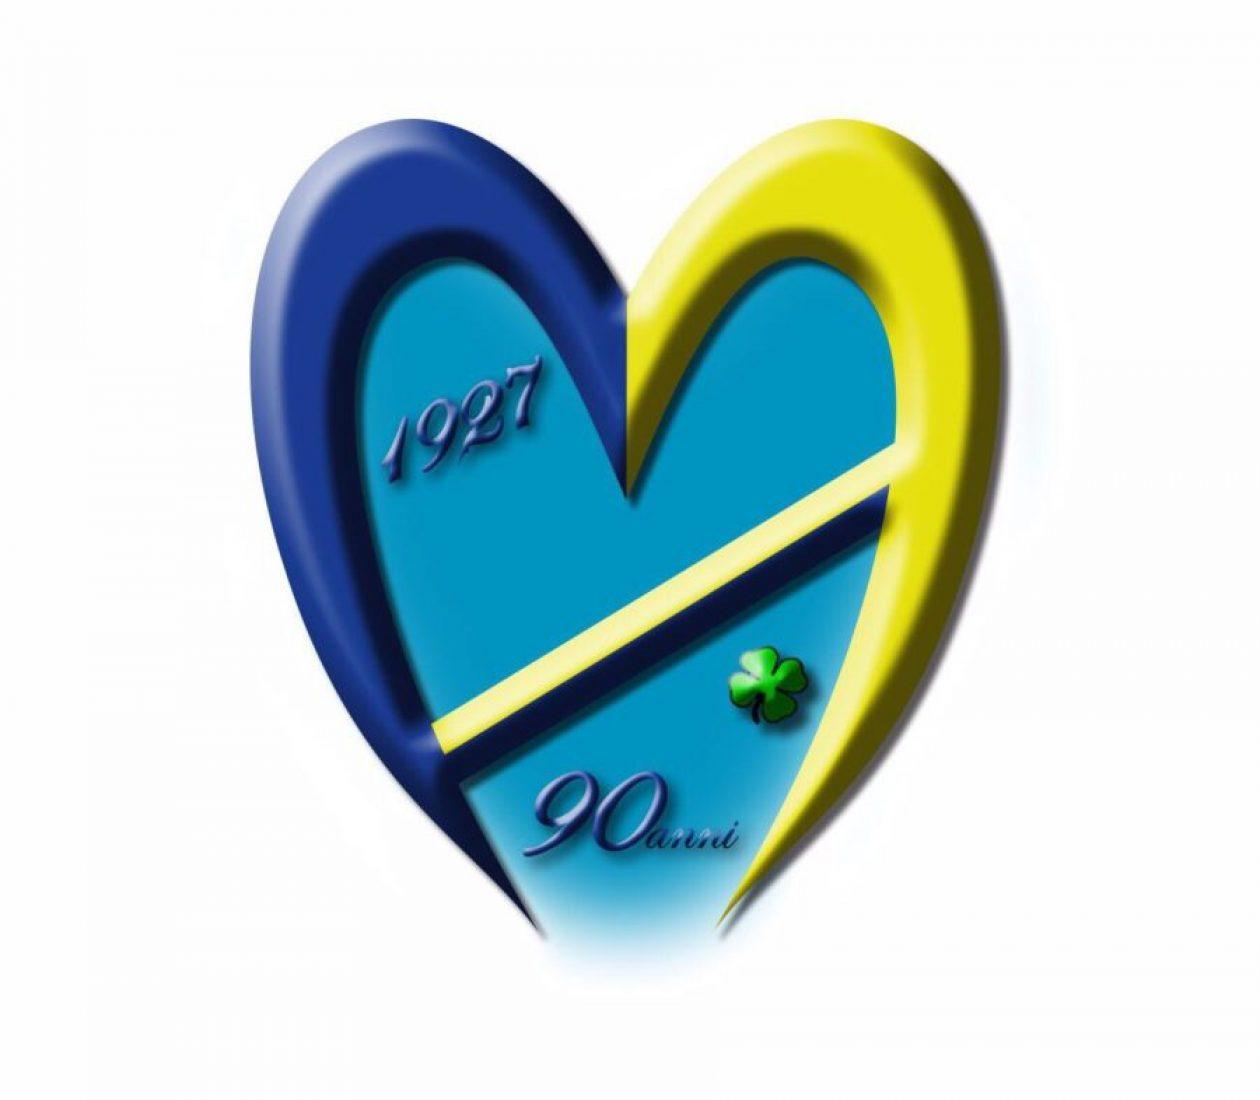 Logo ufficiale 90 anni Macallesi